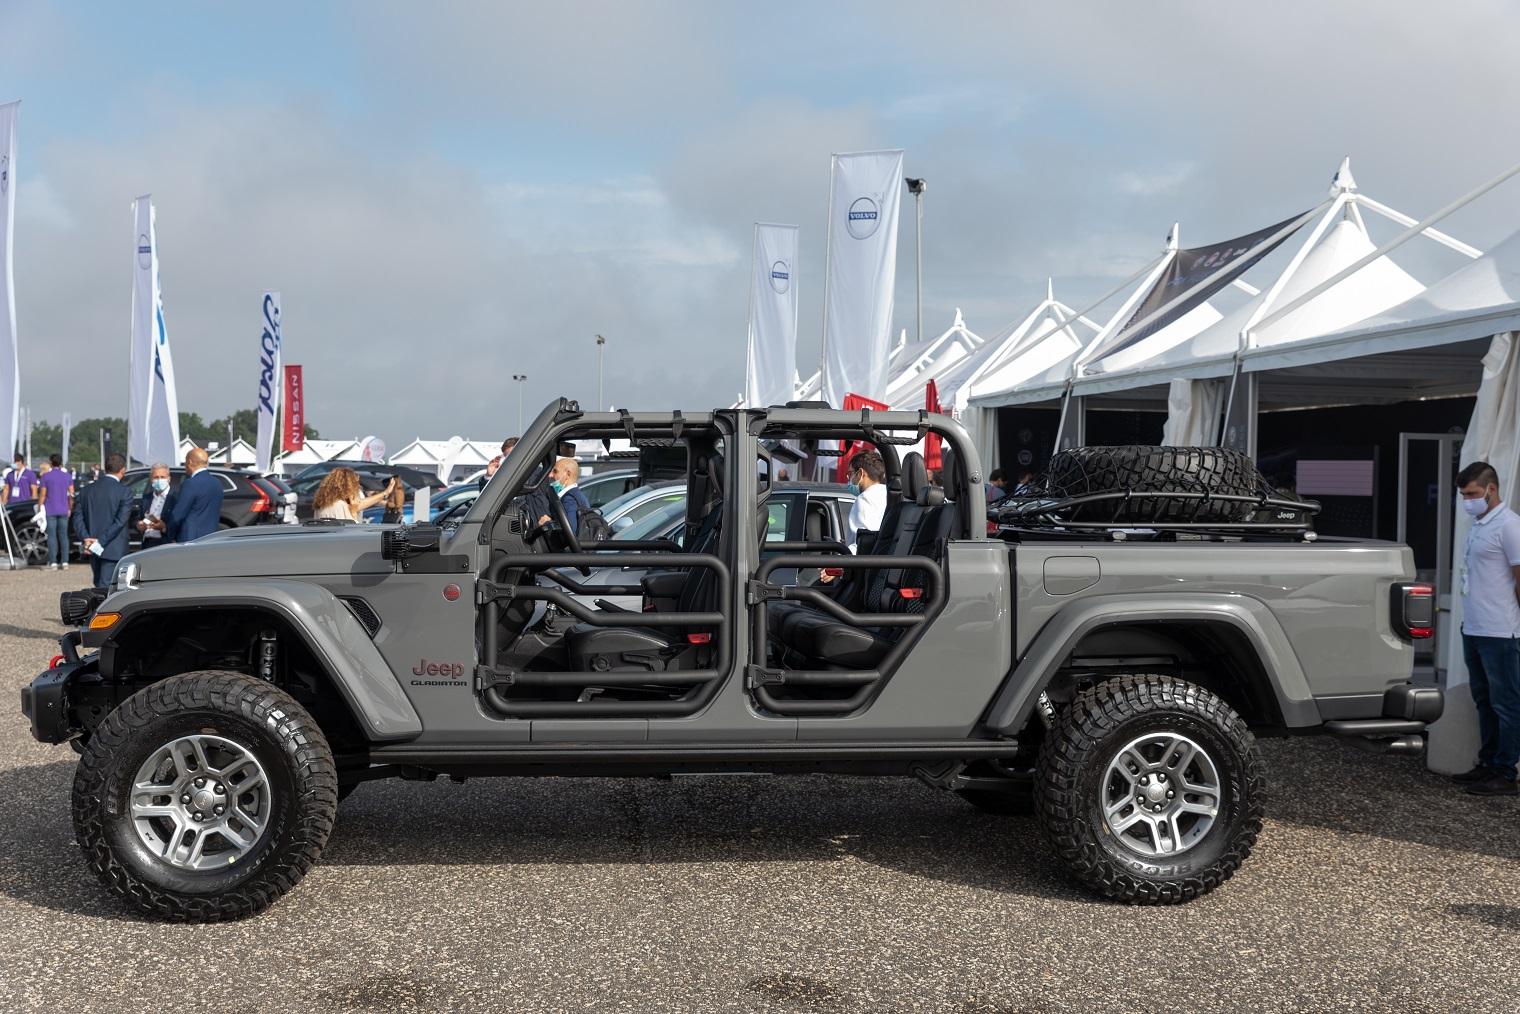 nuova Jeep Gladiator Fleet Motor Day 2020